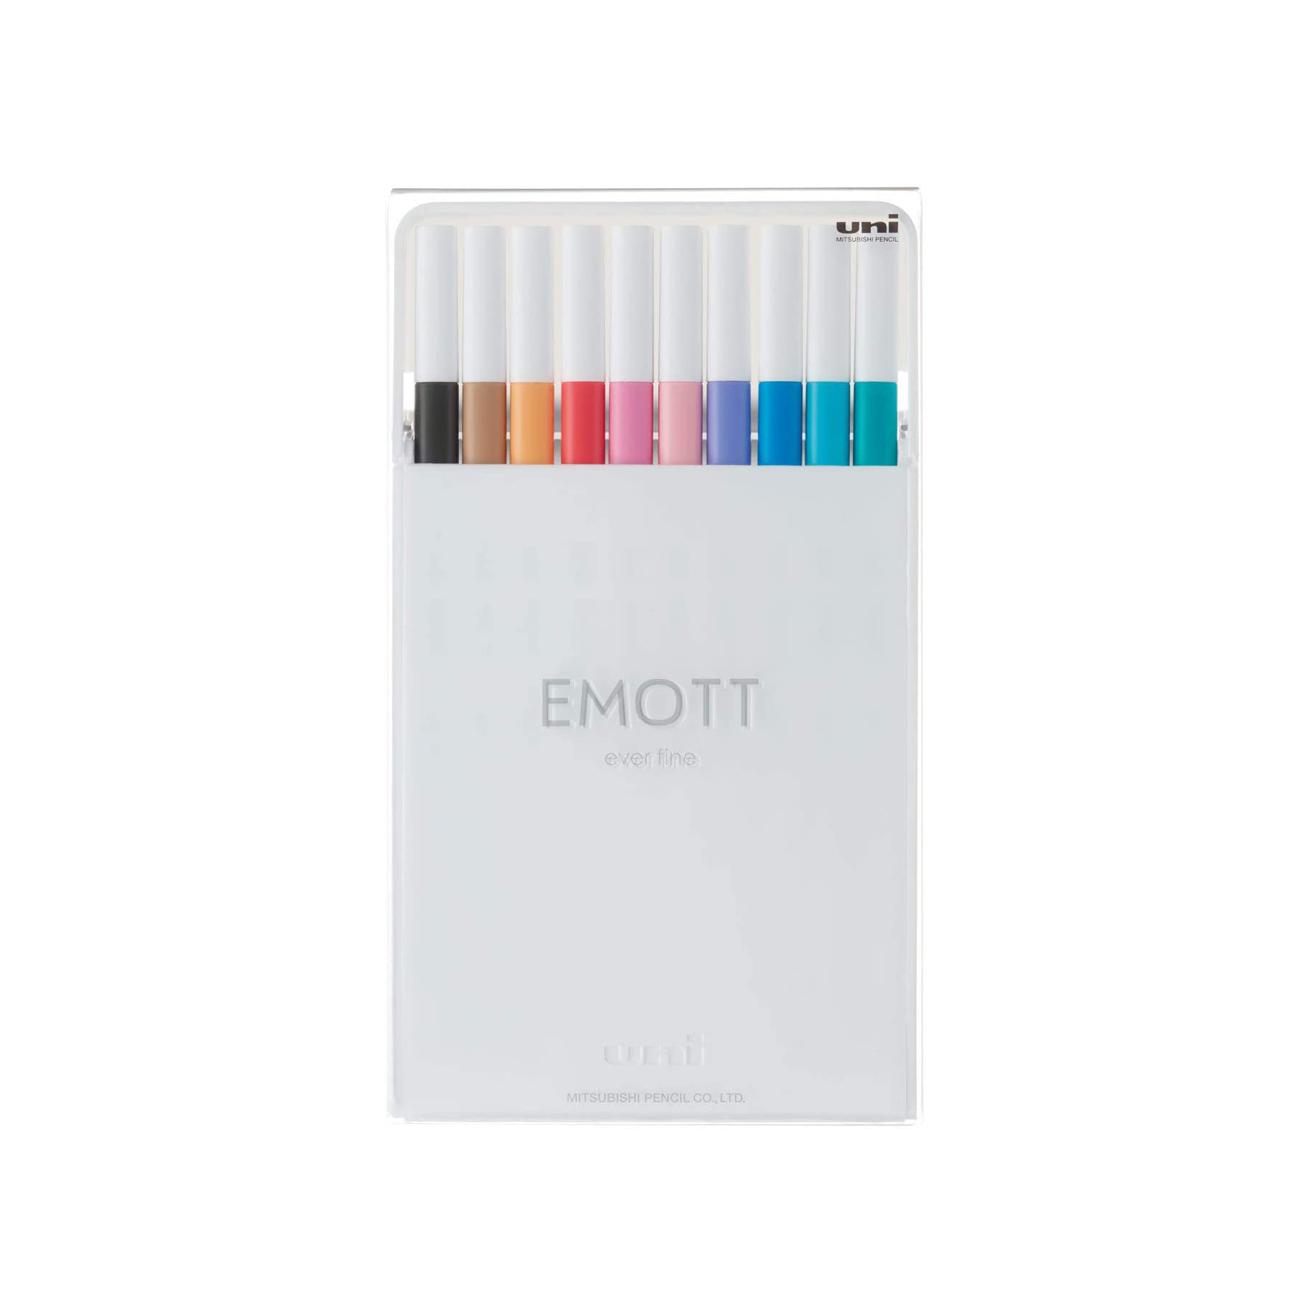 EMOTT Pastel Pen Set!